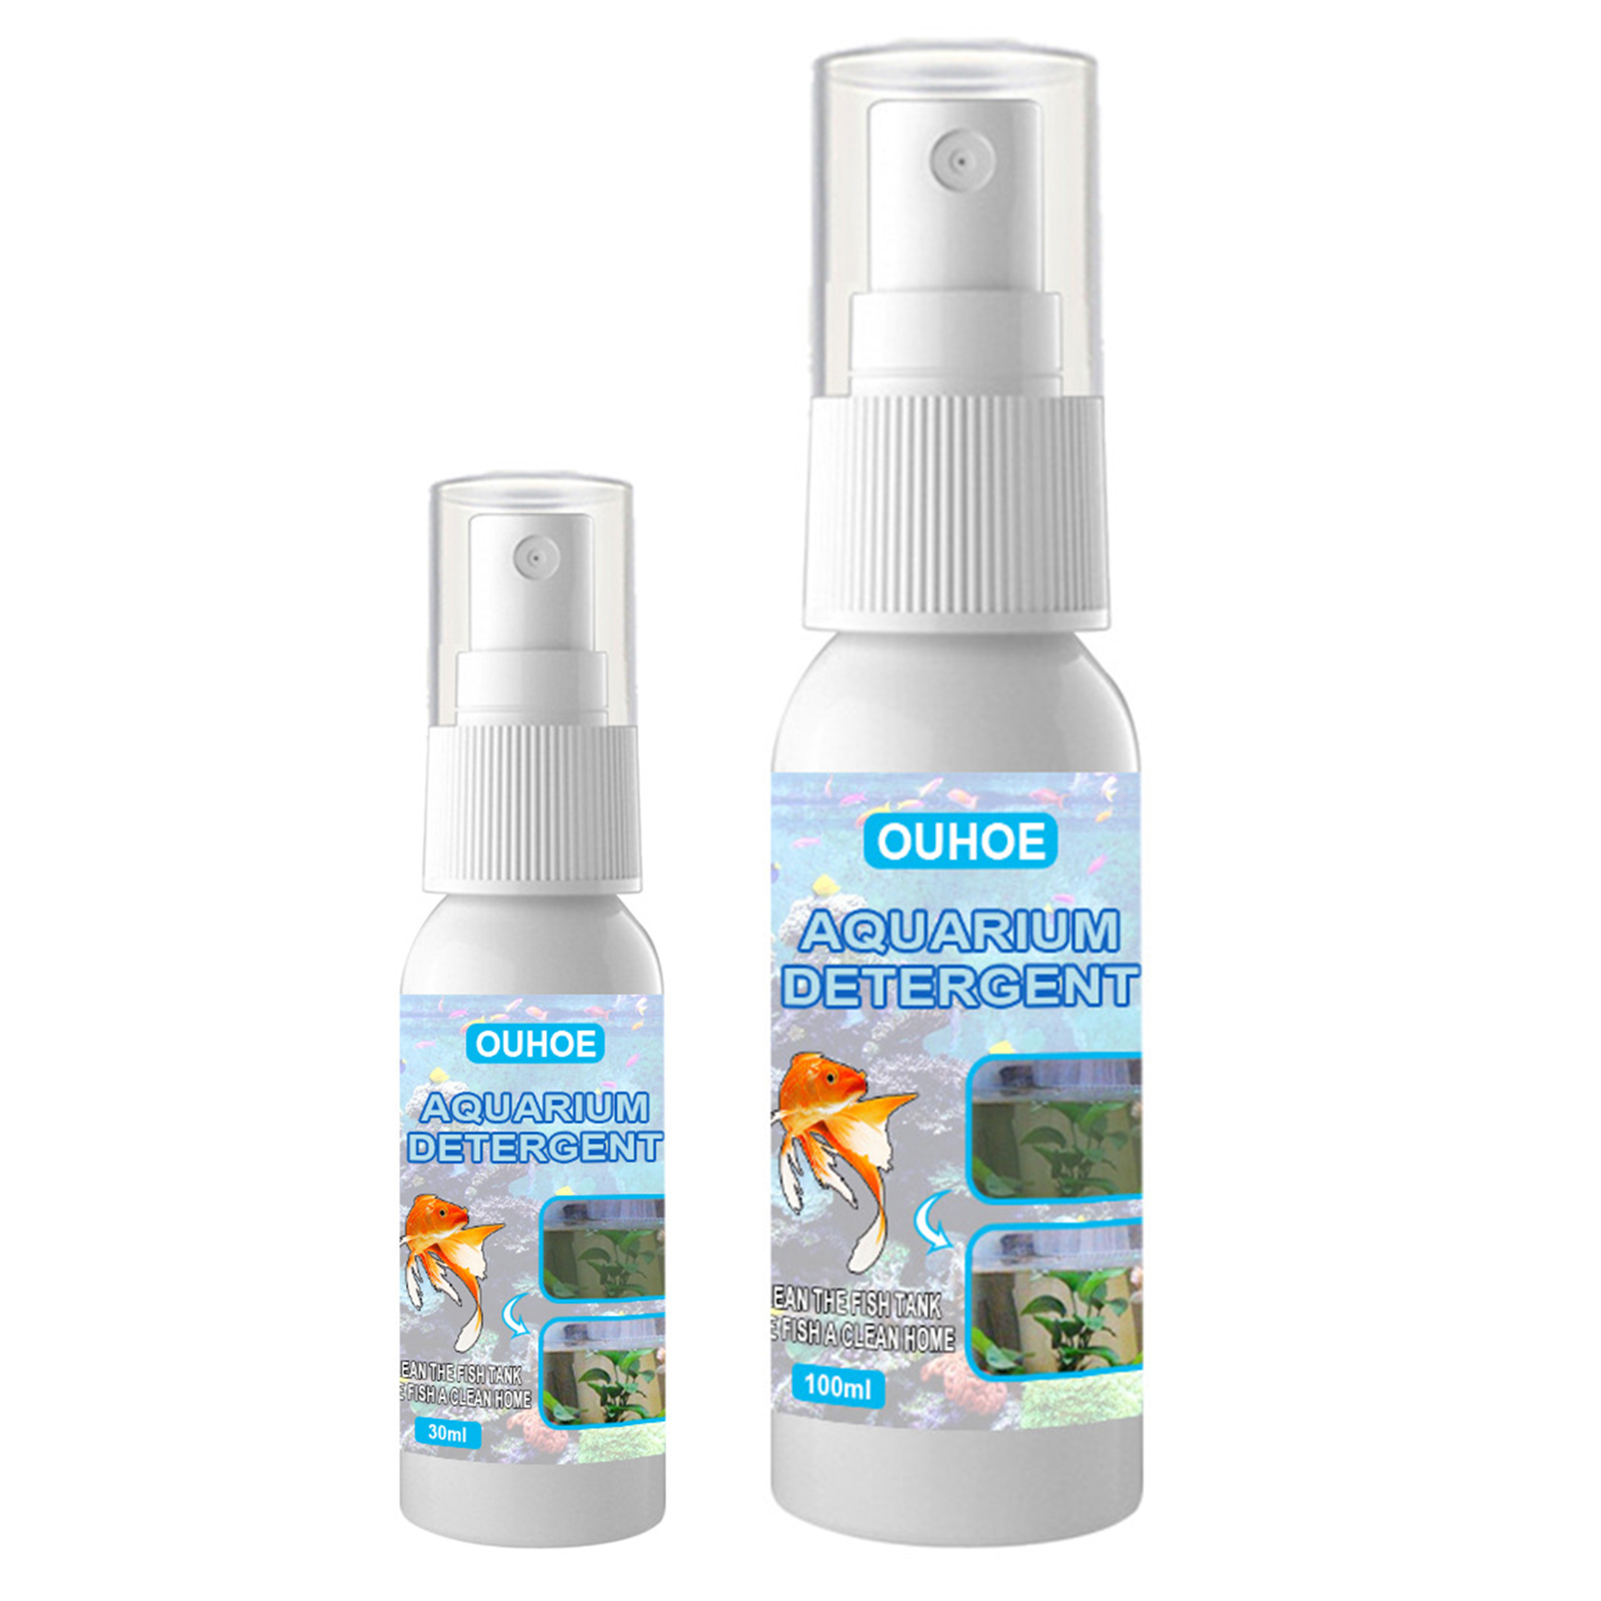 Aquarium Aquatic Algae Control Purifier Agent High Effective Safe Nuisance Algae Remover Highly Efficient And Easy To Use